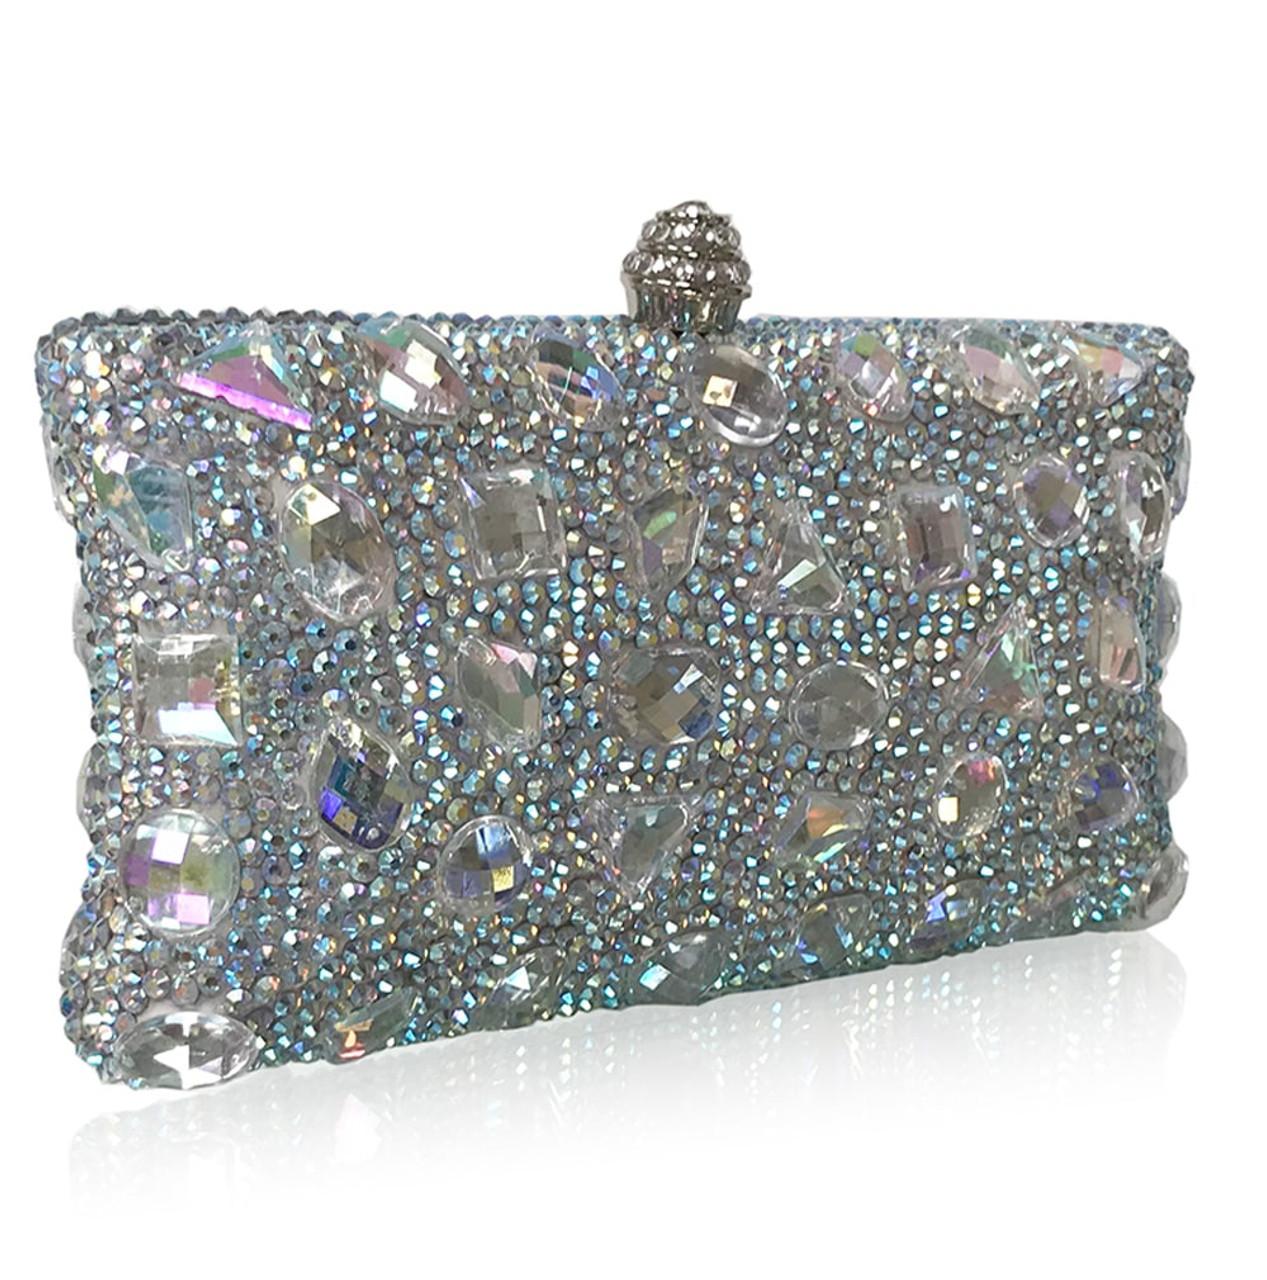 Diamond Forst Luxury Clutch